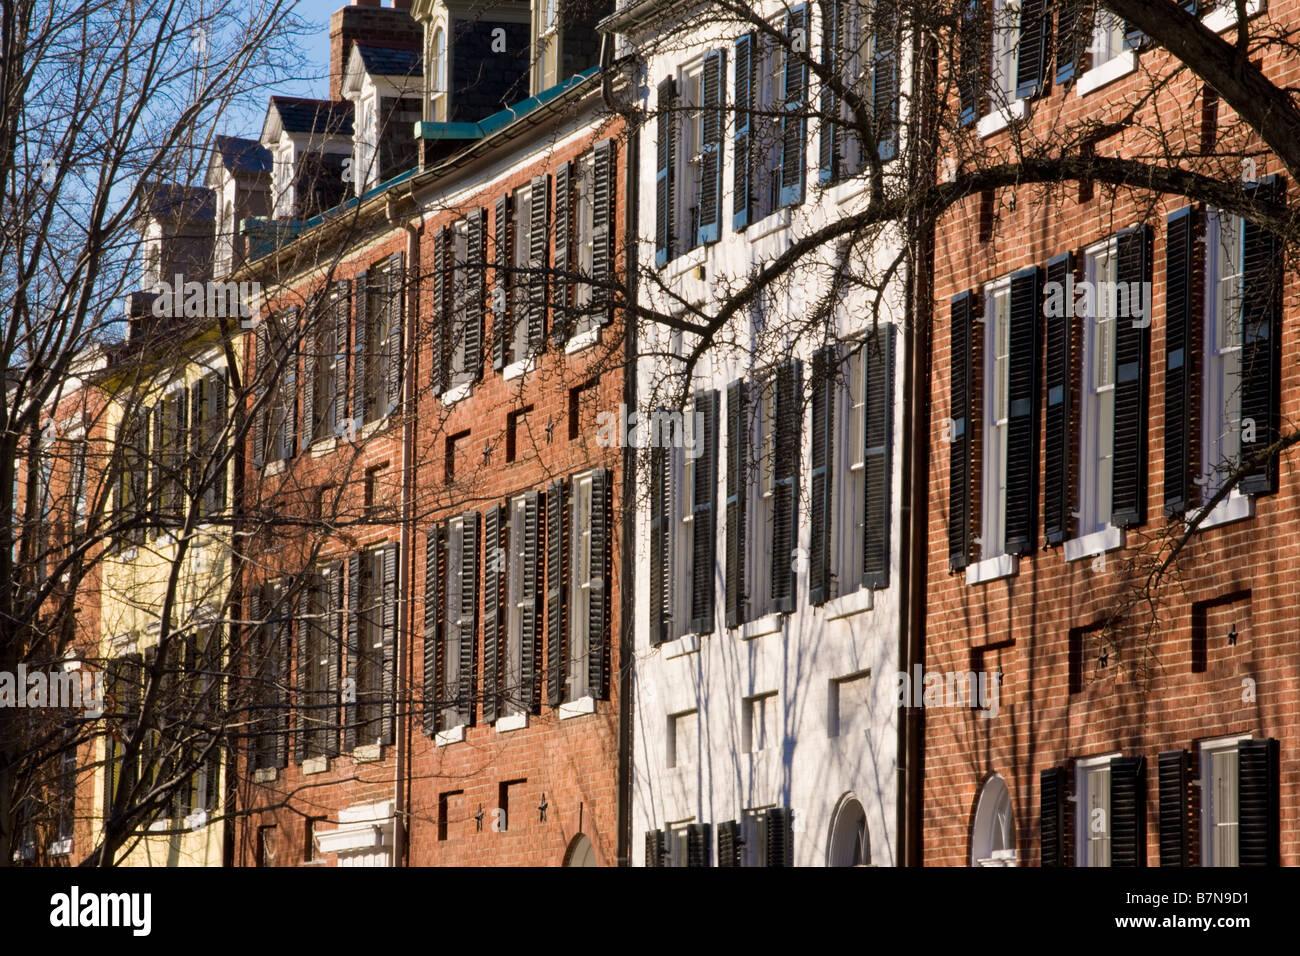 Exclusive N Street residences Georgetown Washington D.C. - Stock Image